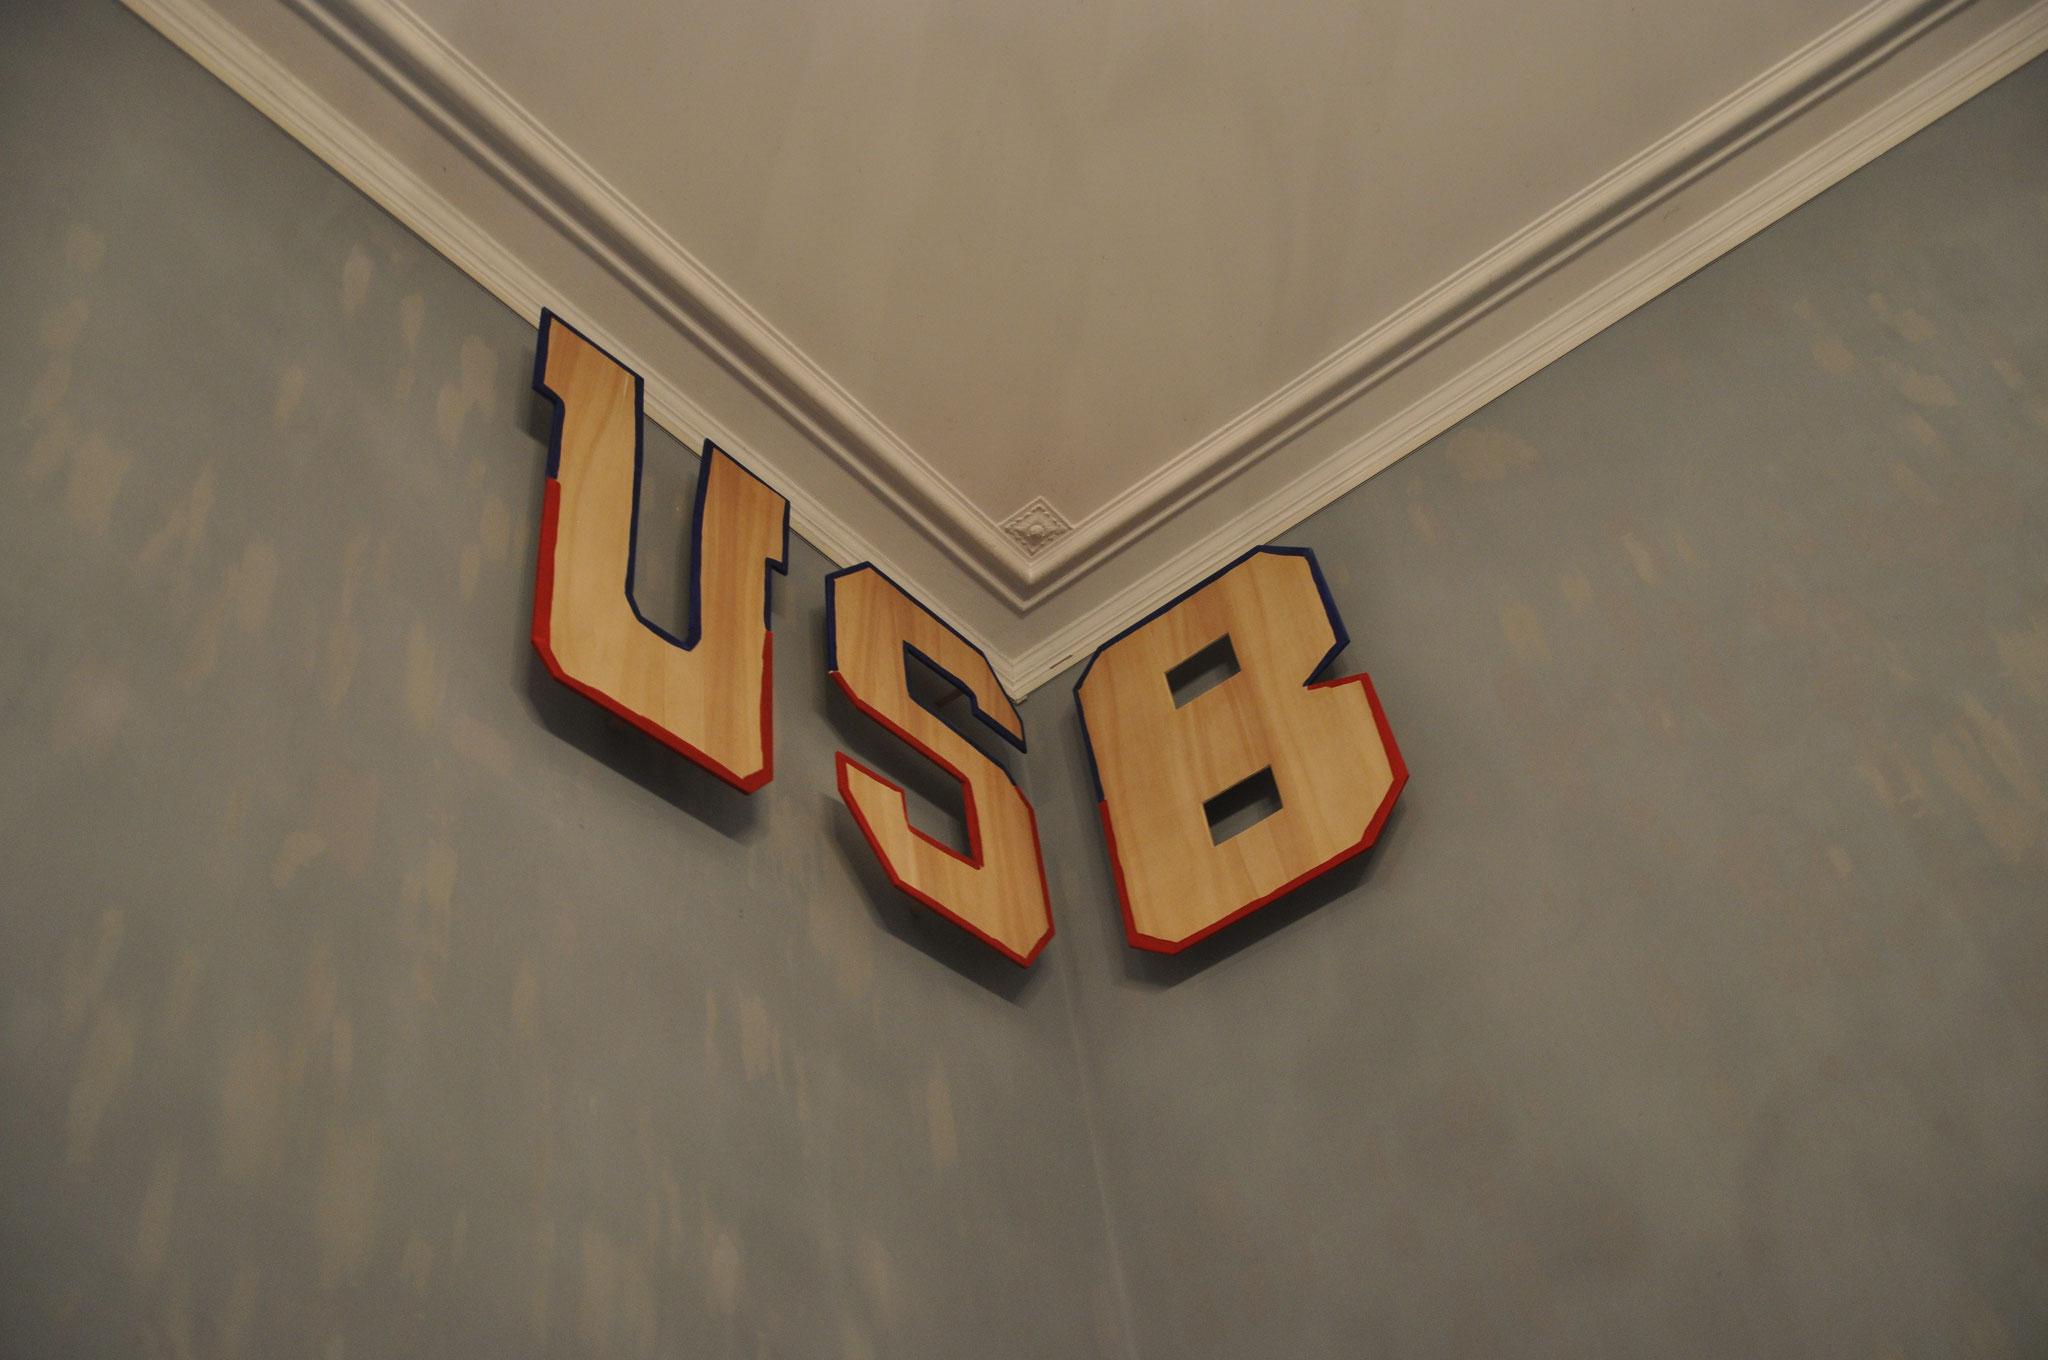 USB, 2019, Acryl auf Pappelpressholz